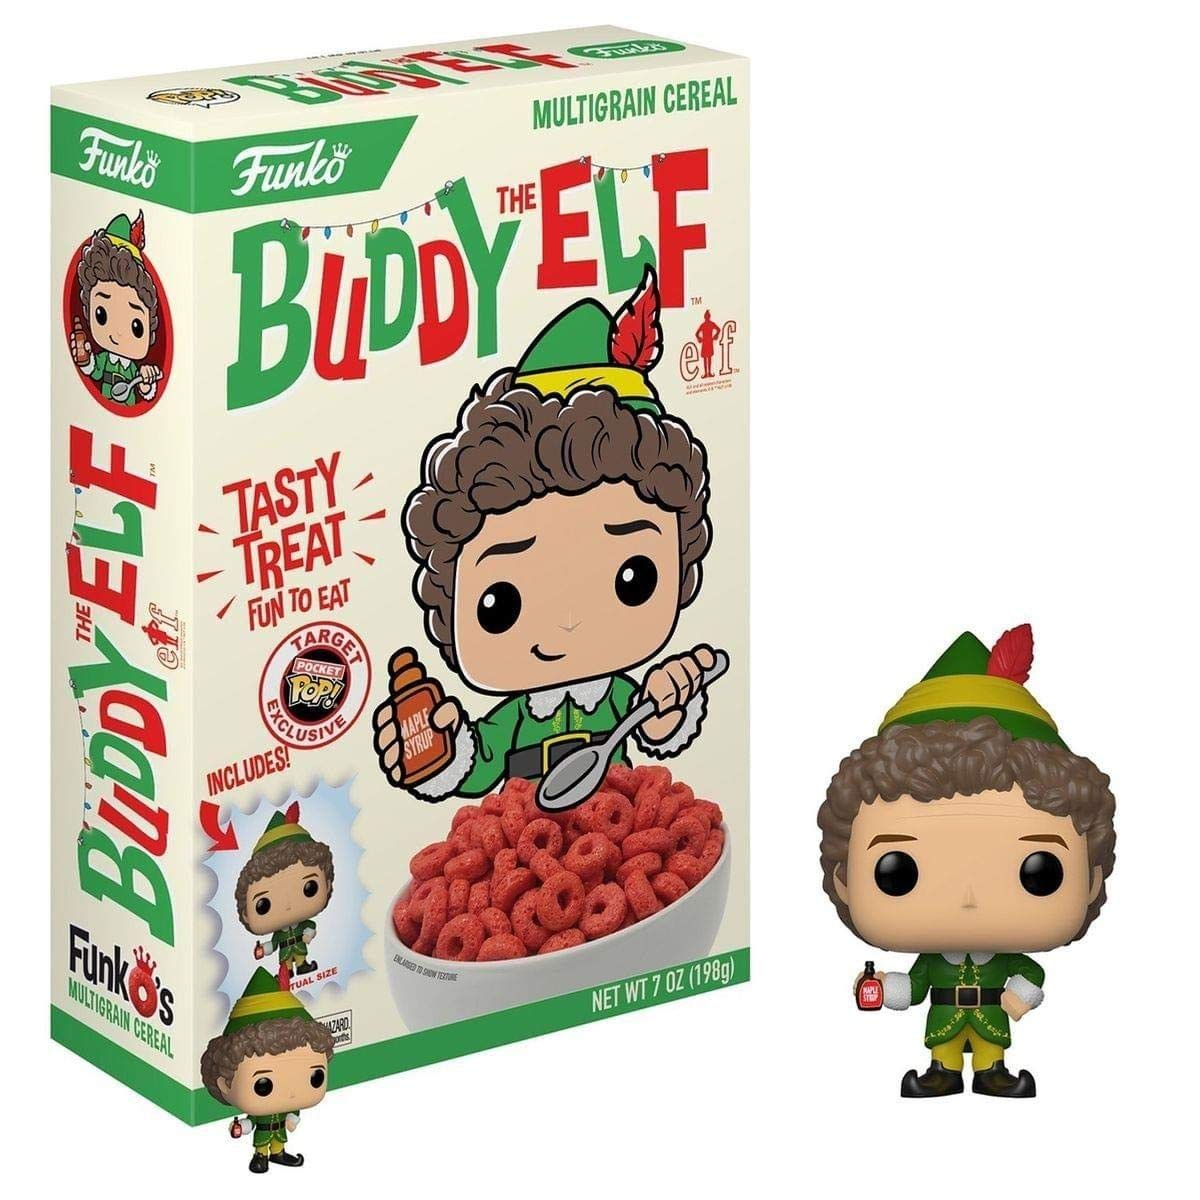 Amazon.com: Batgirl FunkO's Cereal With Exclusive Pocket Pop: